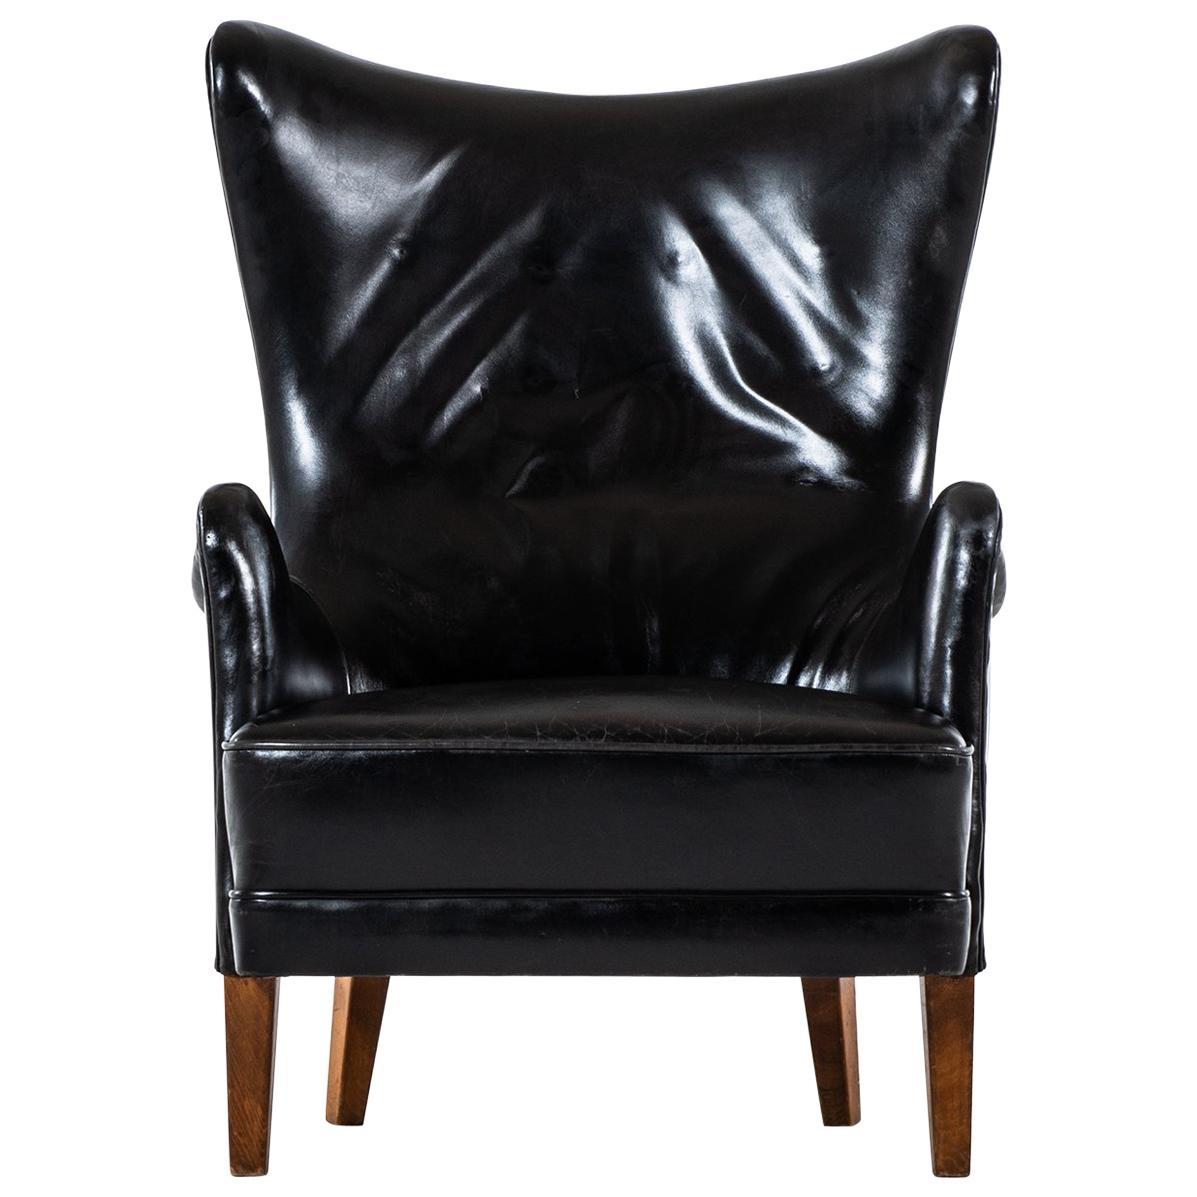 Frits Henningsen Easy Chair from 1935 Produced in Denmark